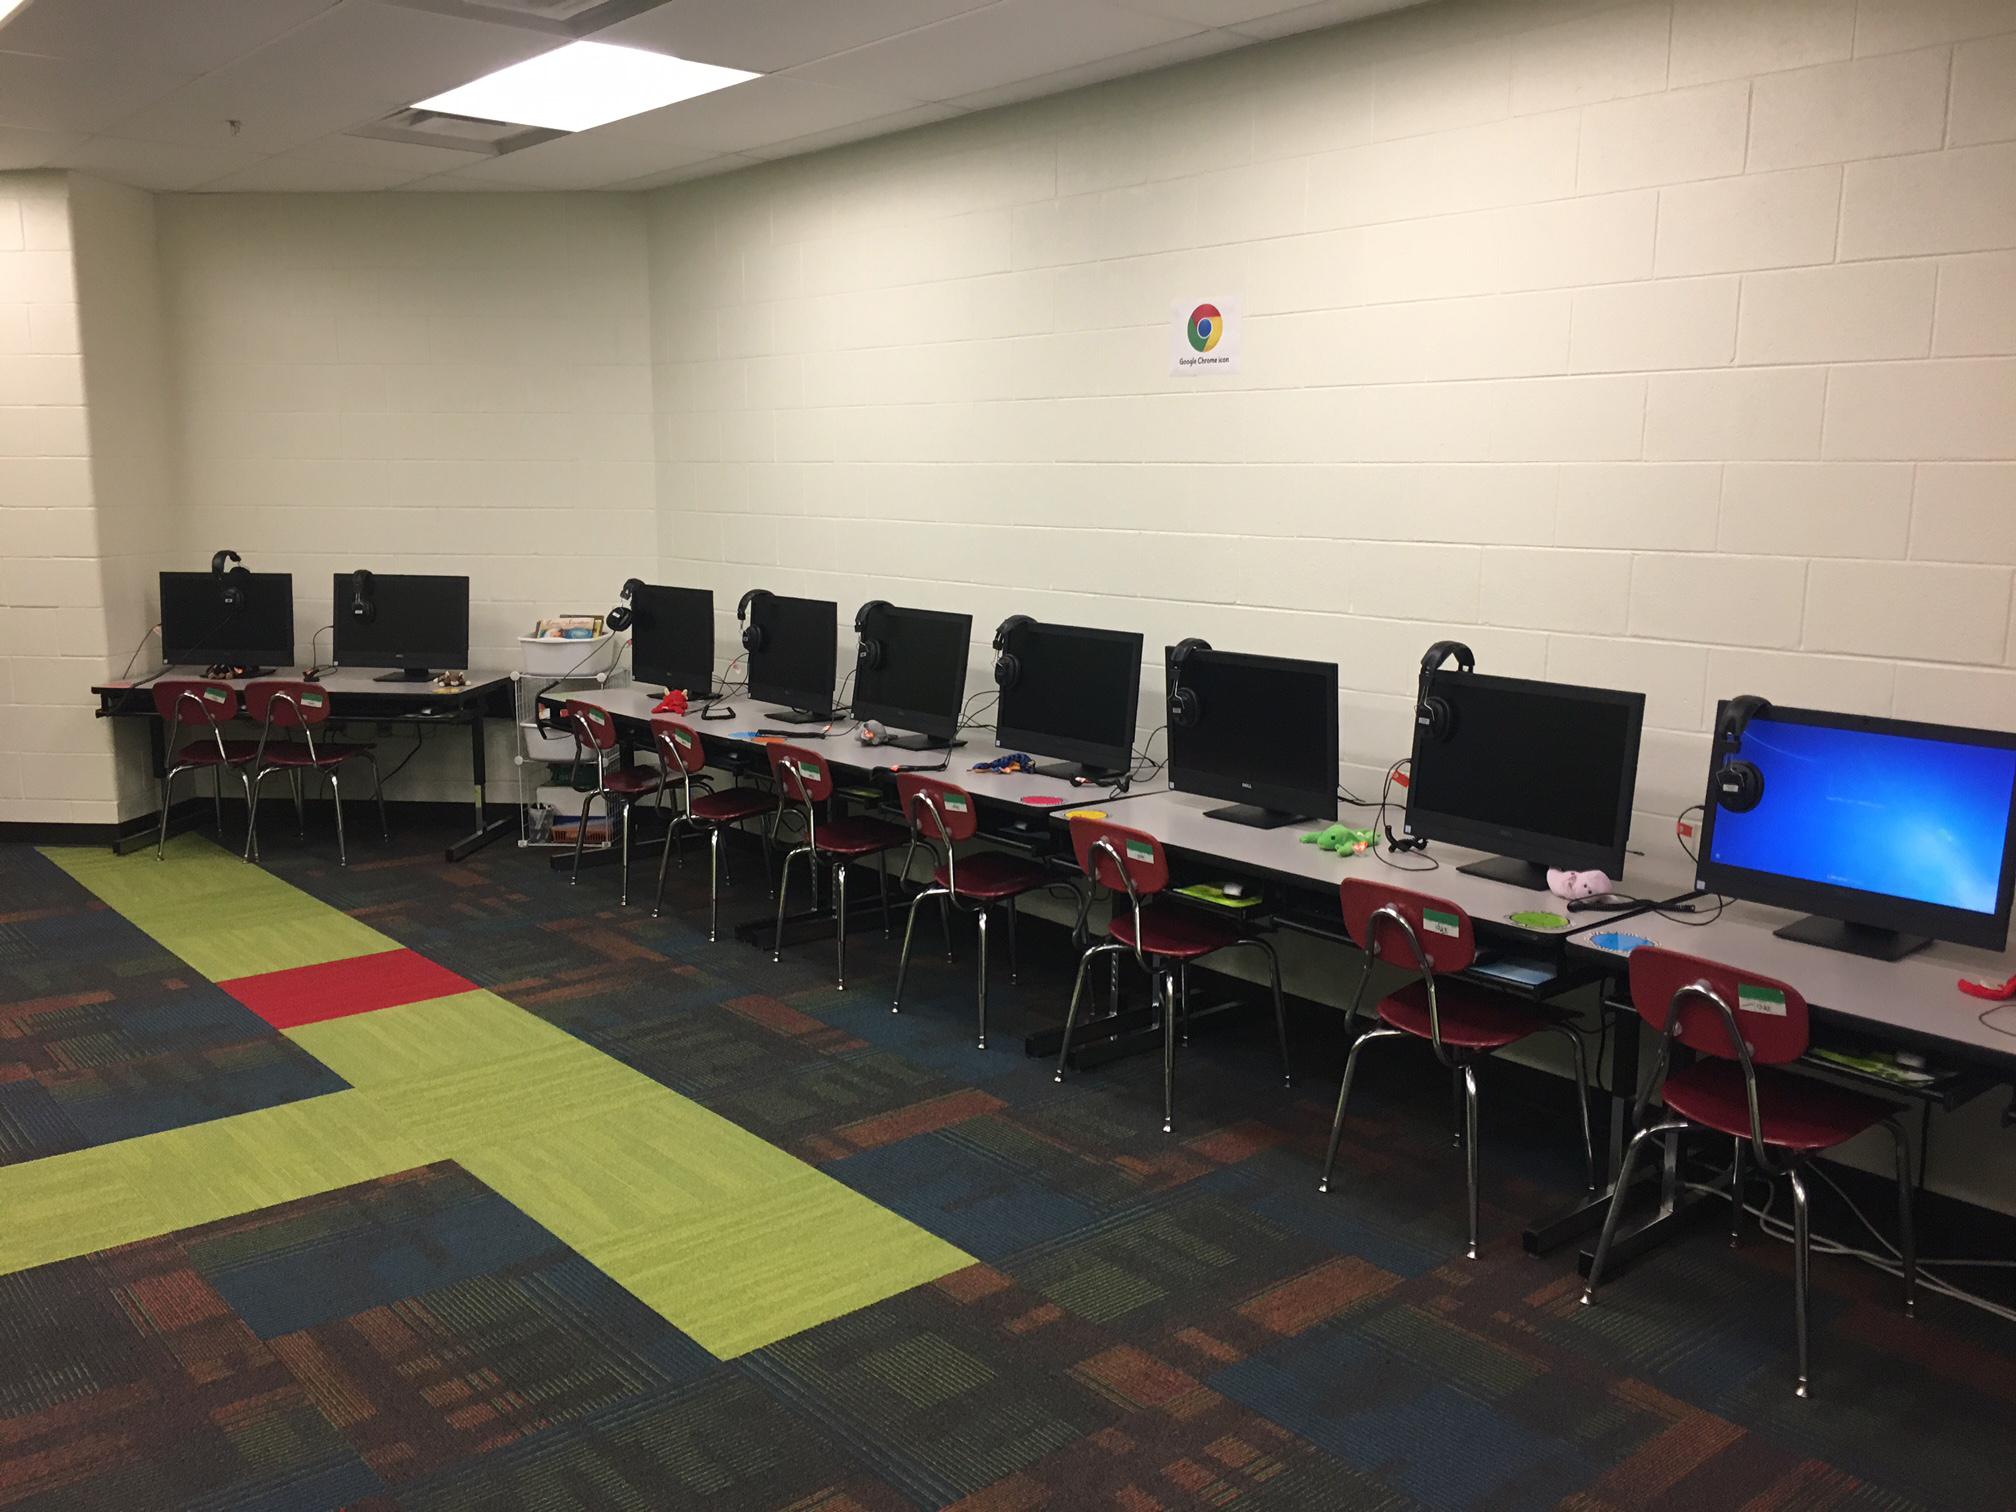 KEYSYS Computer Lab at Magnolia Elementary - KEYSYS.IO